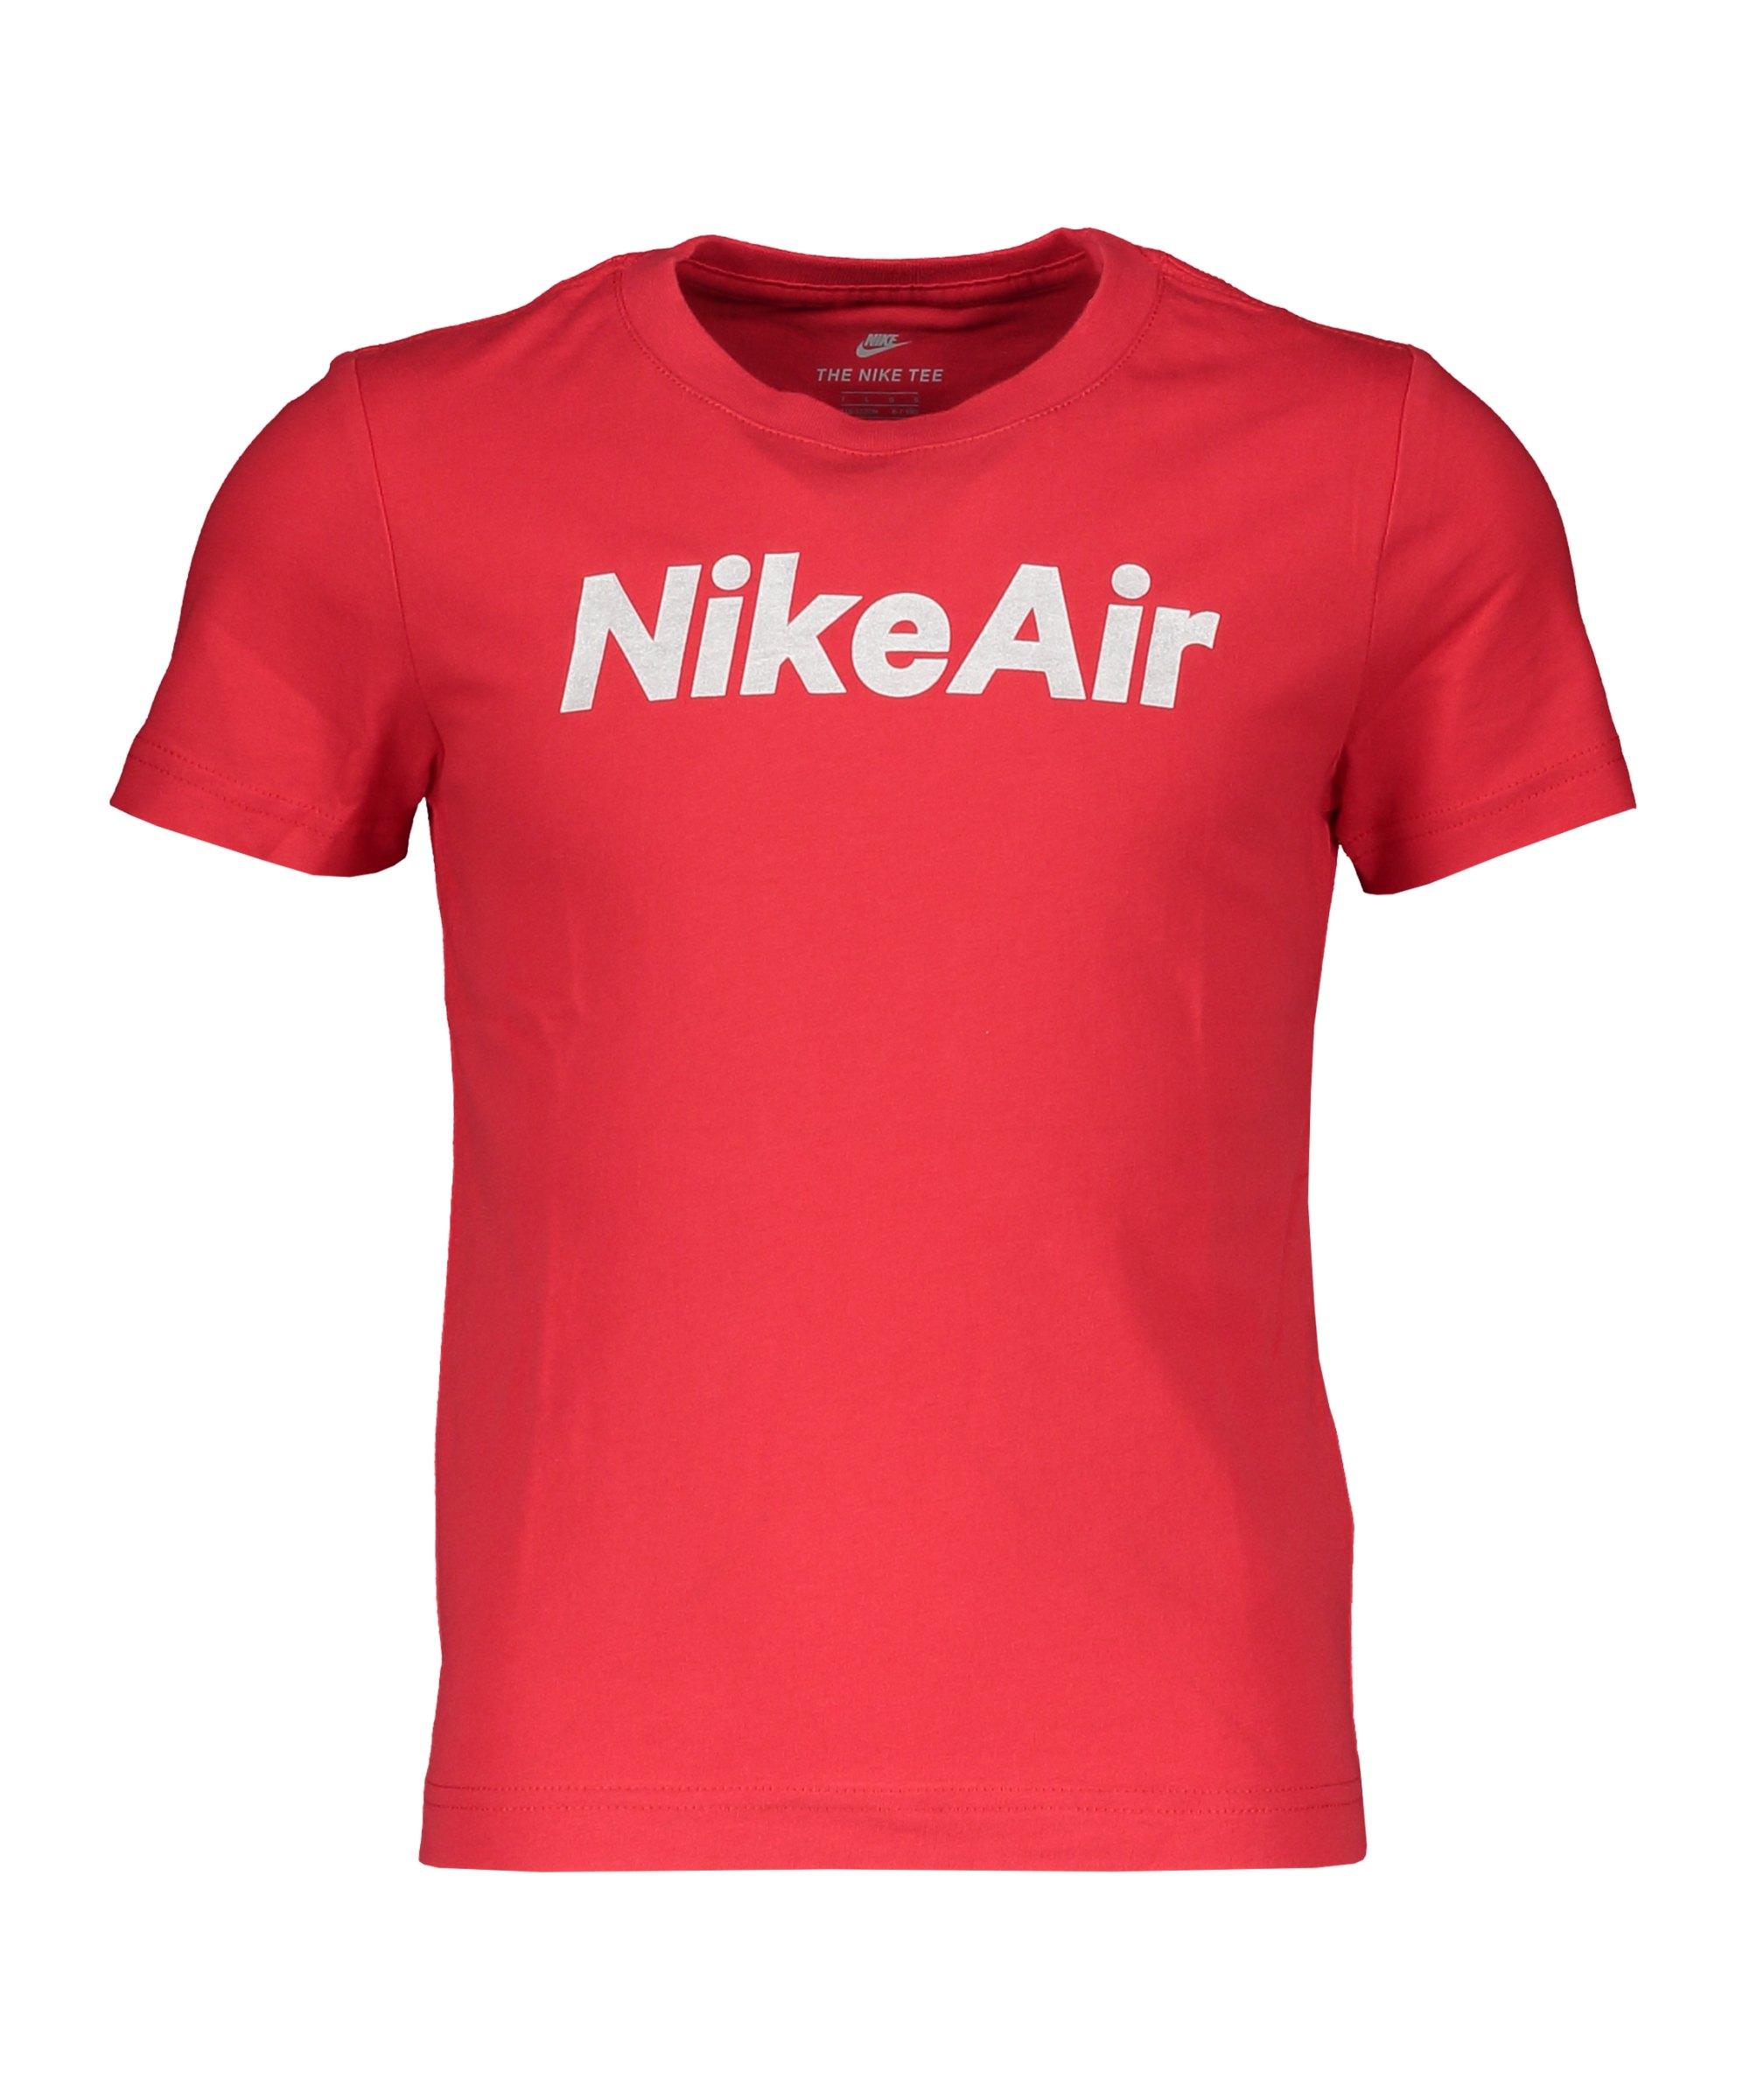 Nike Air T-Shirt Kids Rot FU10 - rot